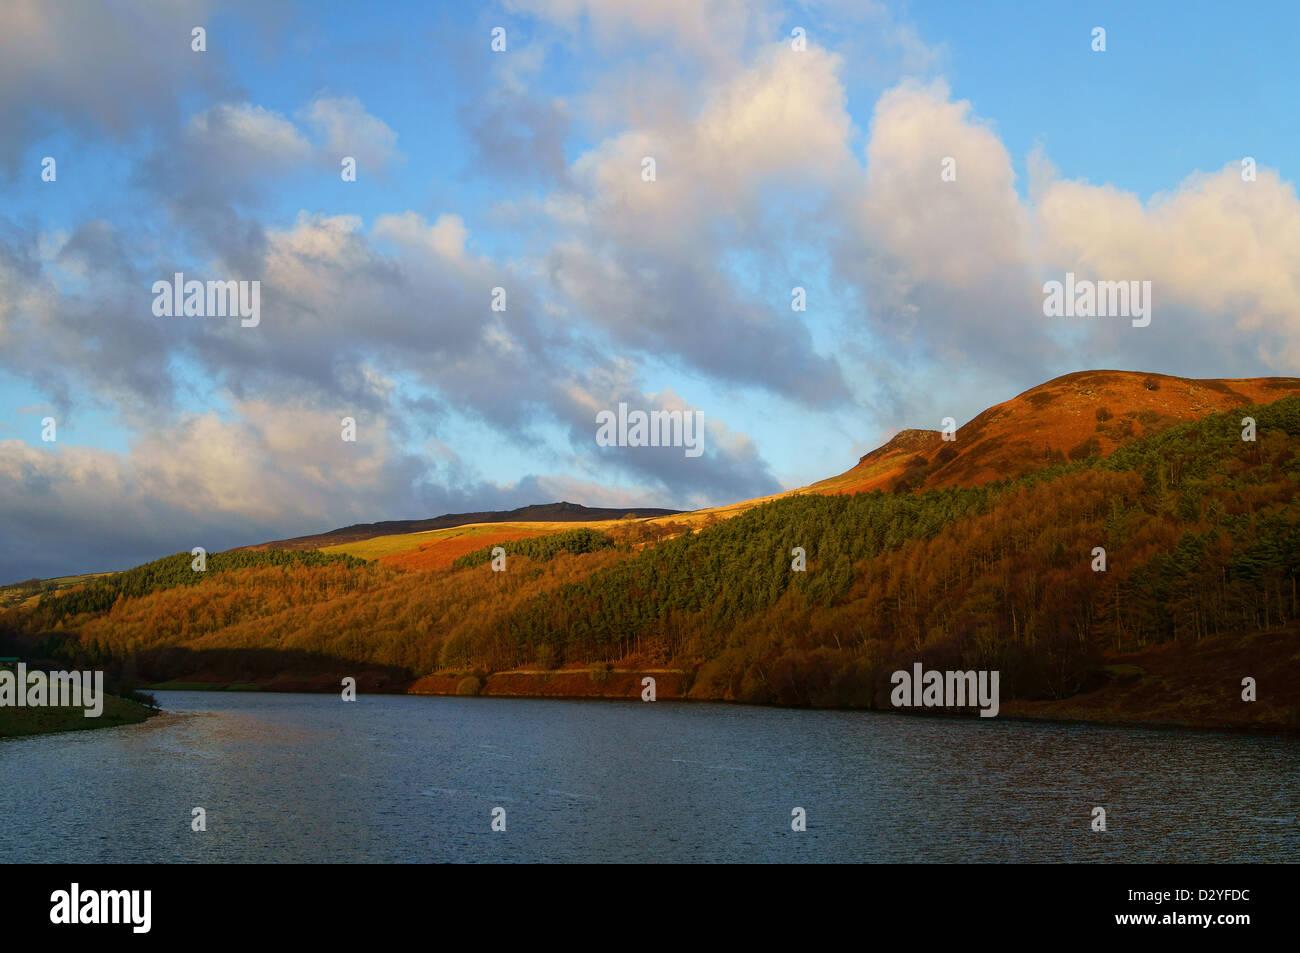 UK, Peak District,Ladybower Reservoir viewed from Ashopton Viaduct - Stock Image